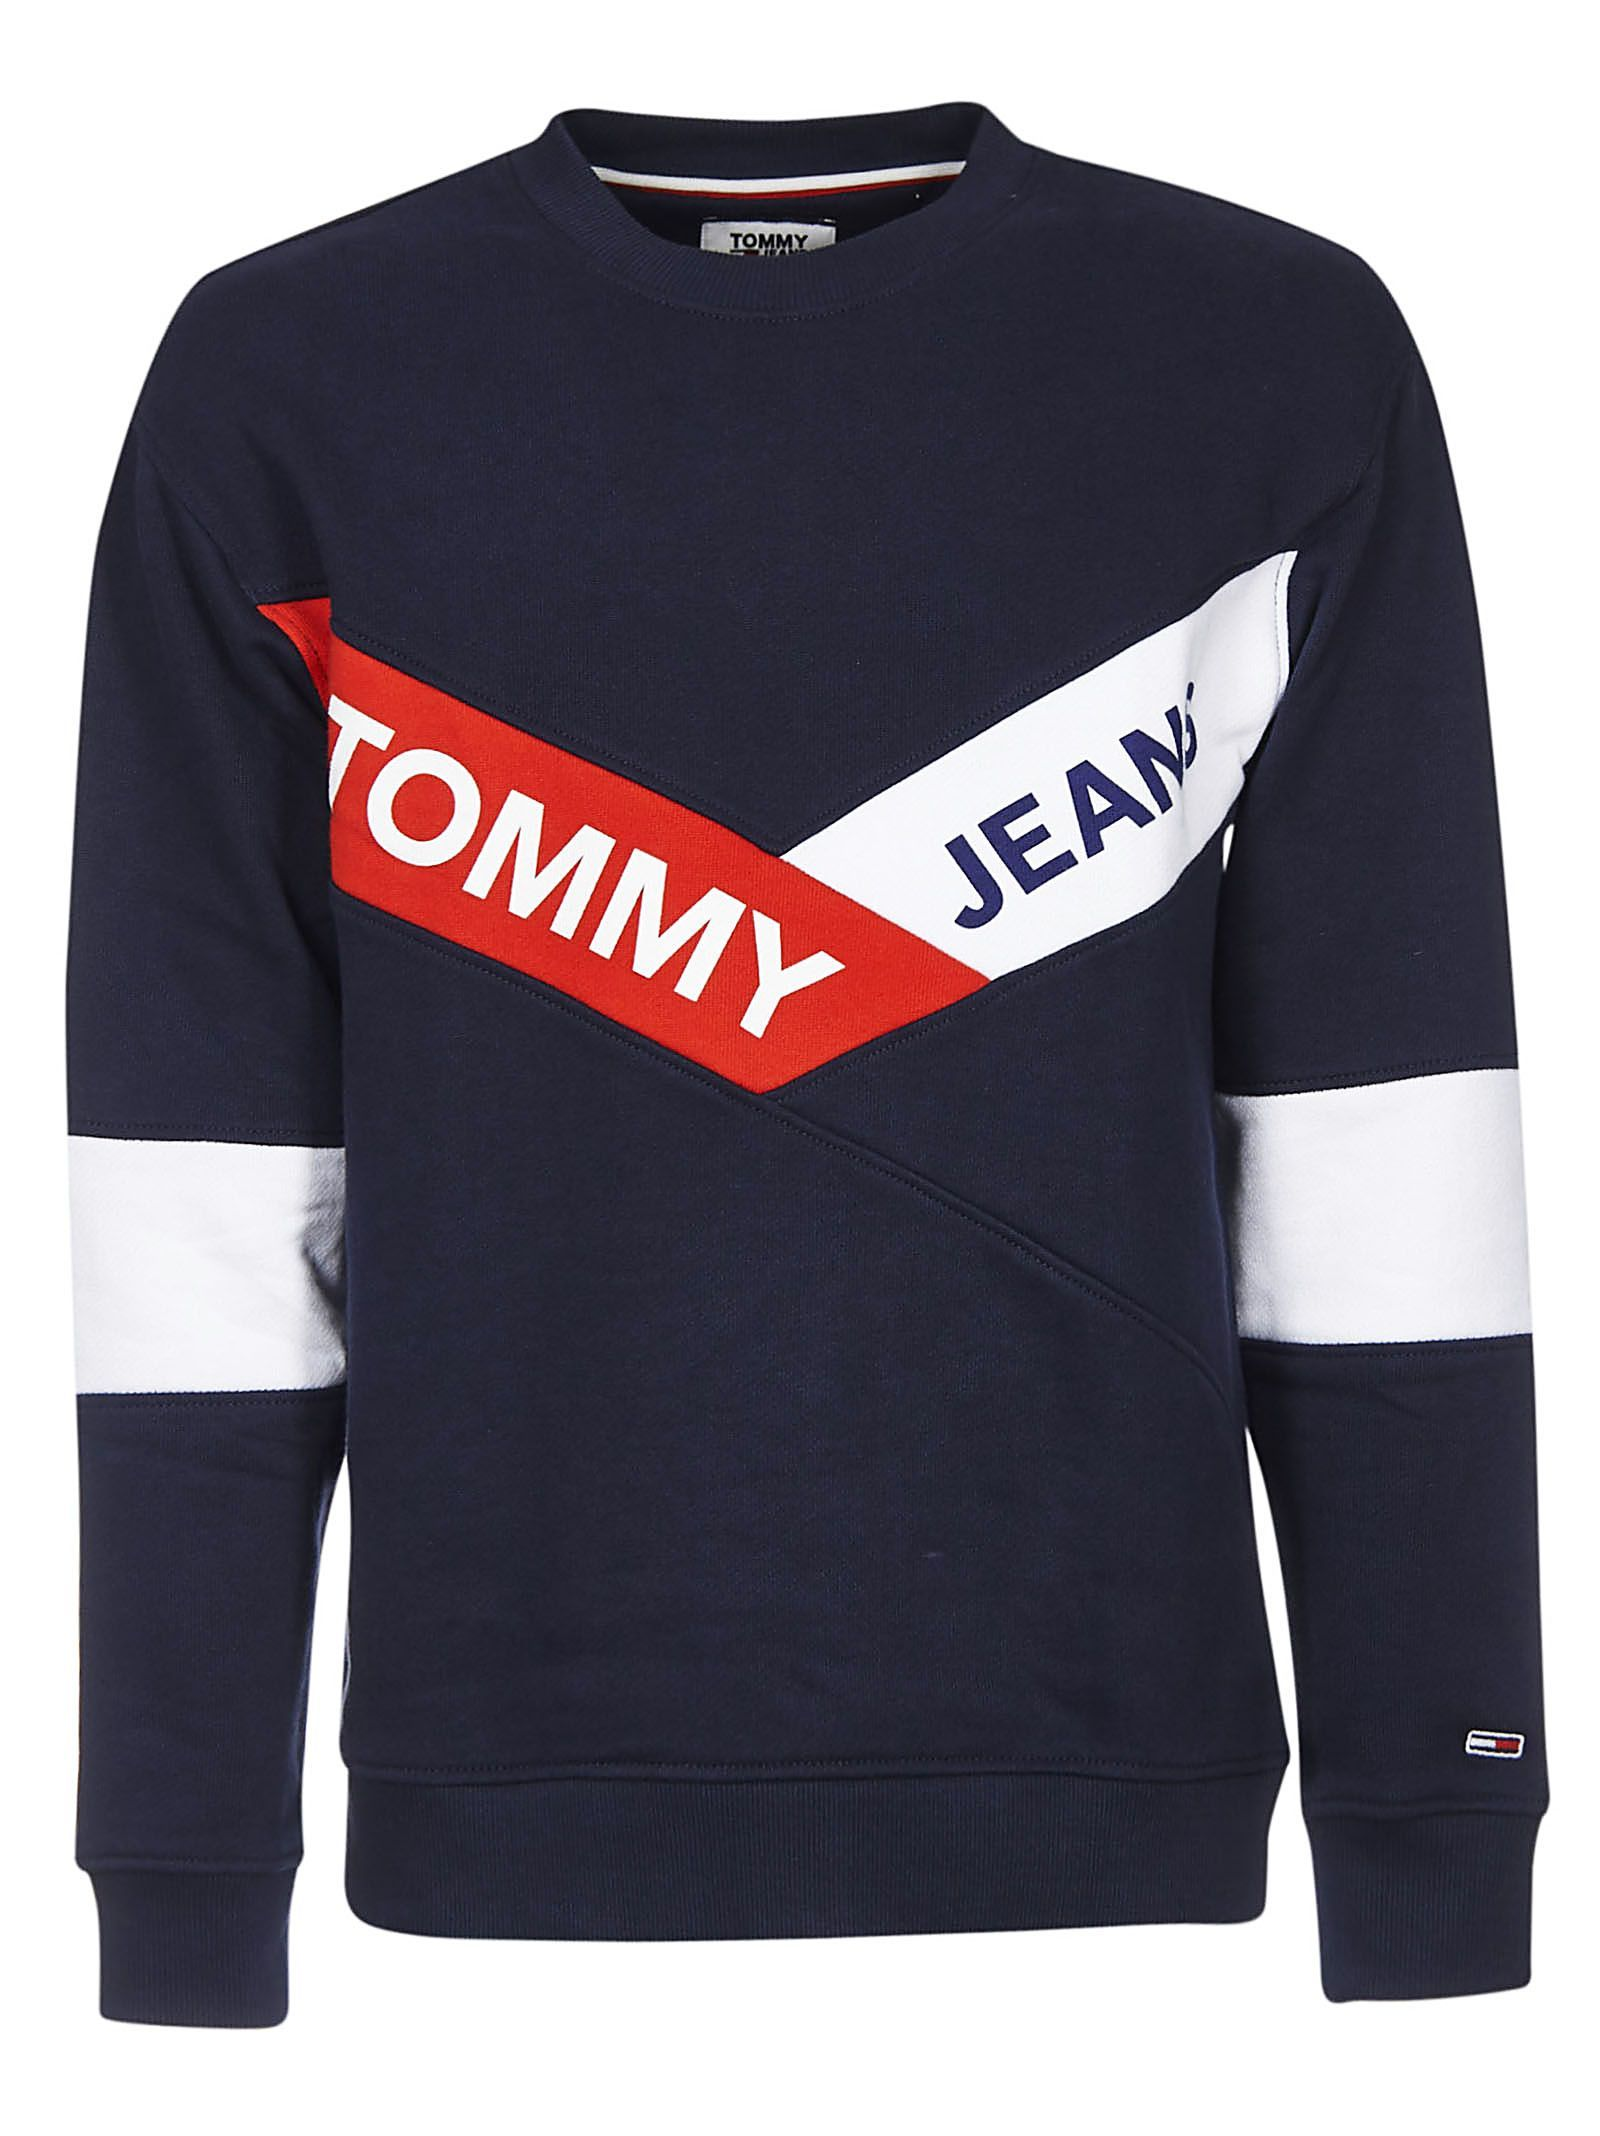 TOMMY HILFIGER . #tommyhilfiger #cloth # | Tommy Hilfiger in